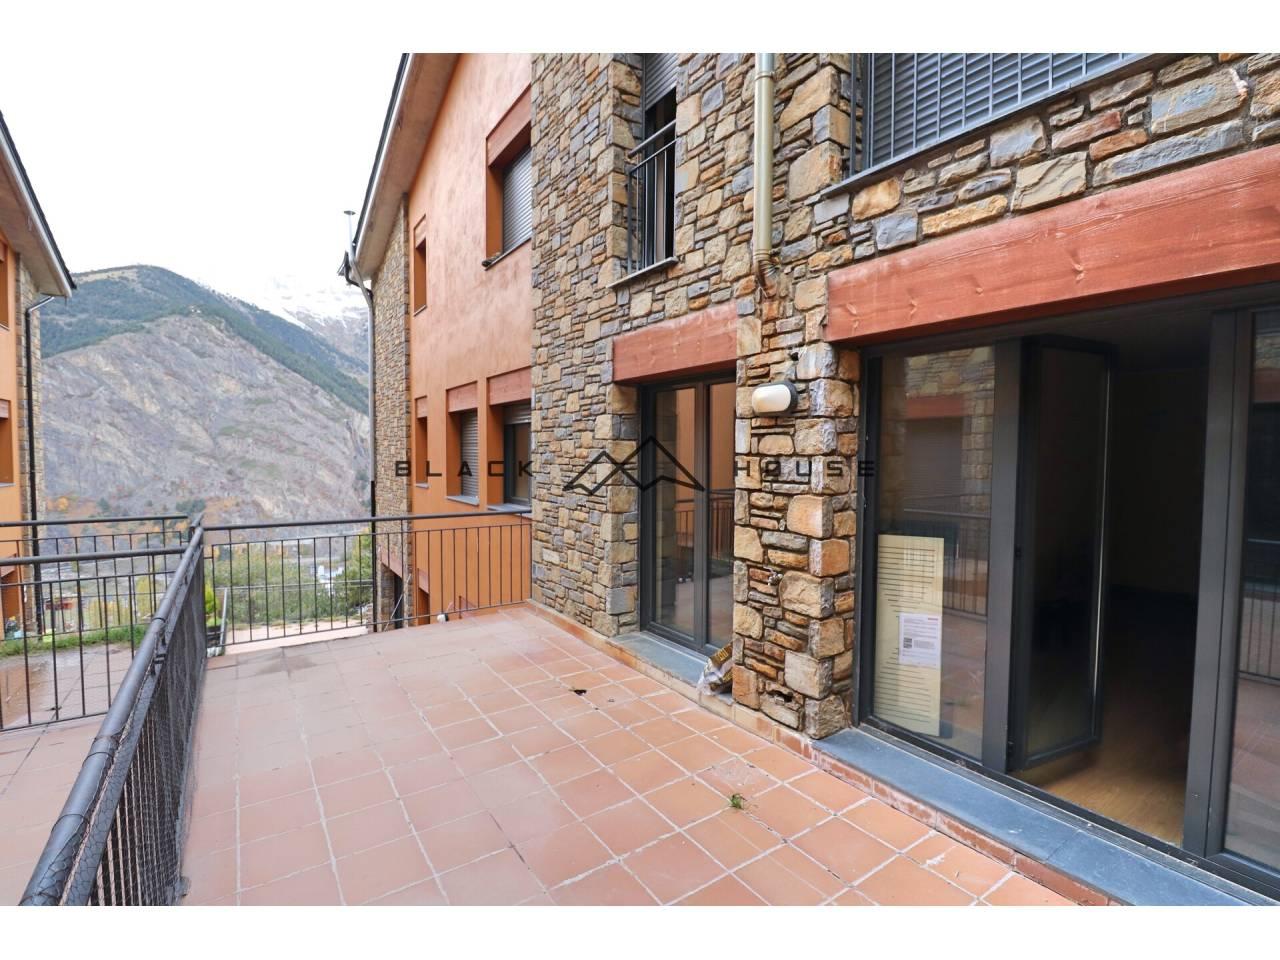 Apartament en venda en Canillo